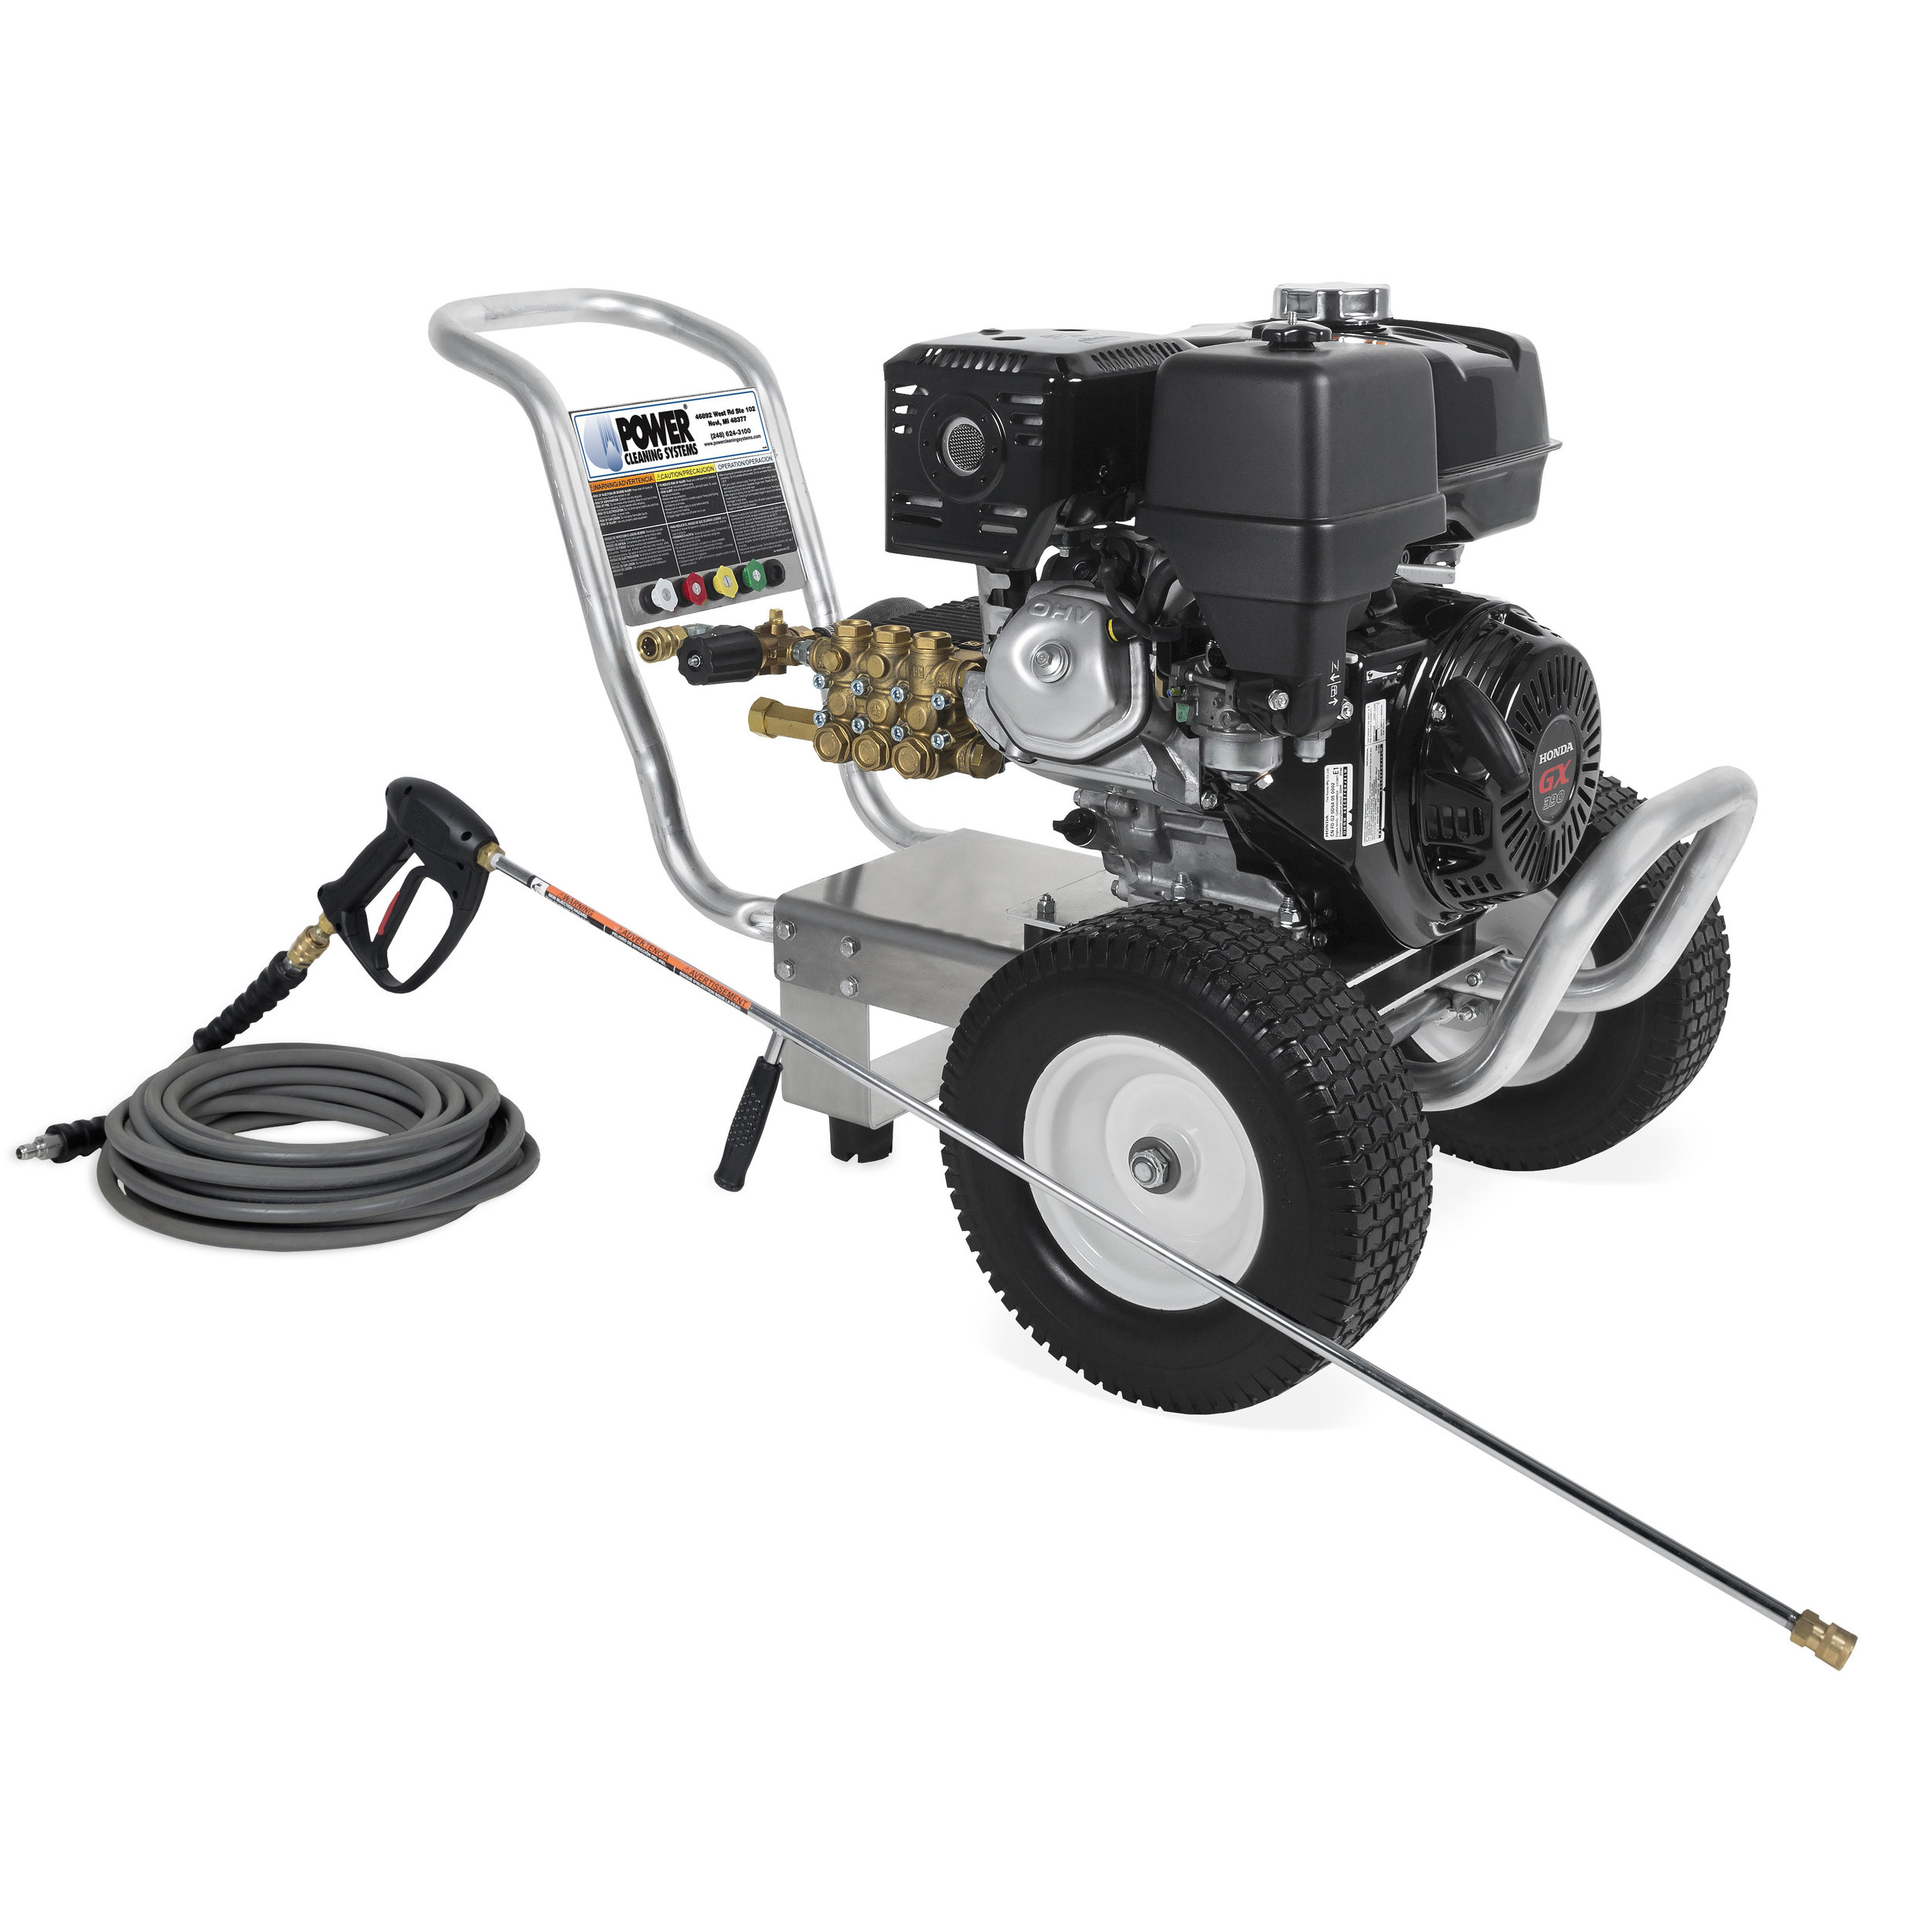 CA-4004-0H6G (Dealer Exclusive) - Mi-T-M Cold Water Pressure Washer